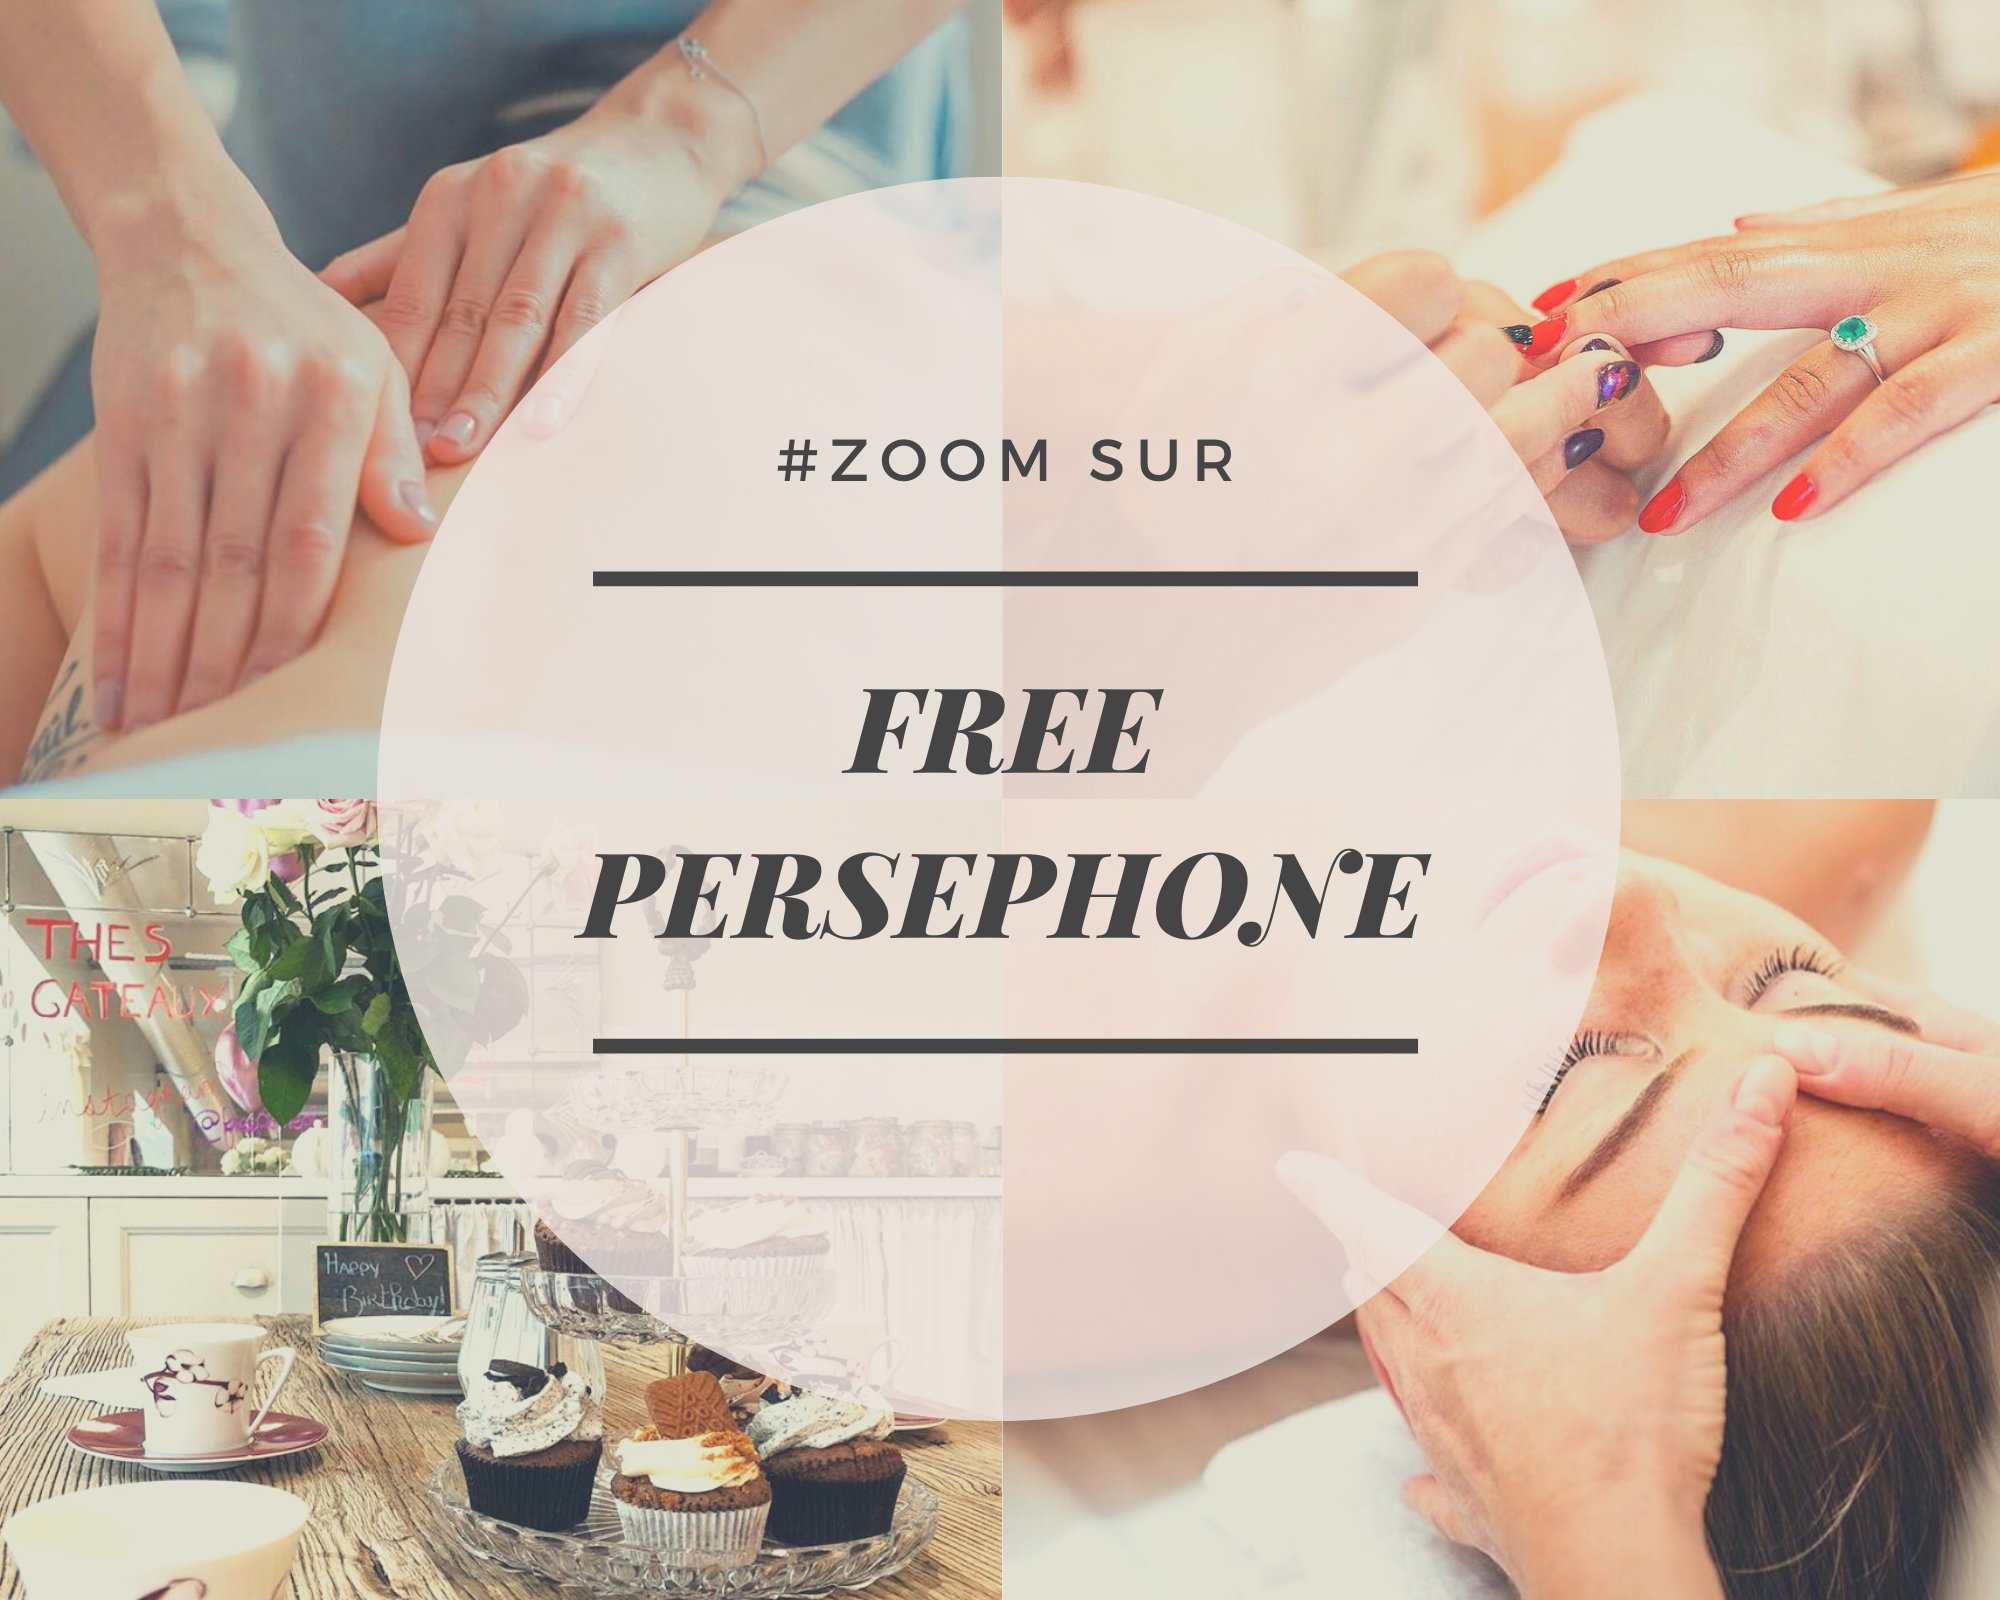 #ZOOM SUR : FREE PERSEPHONE